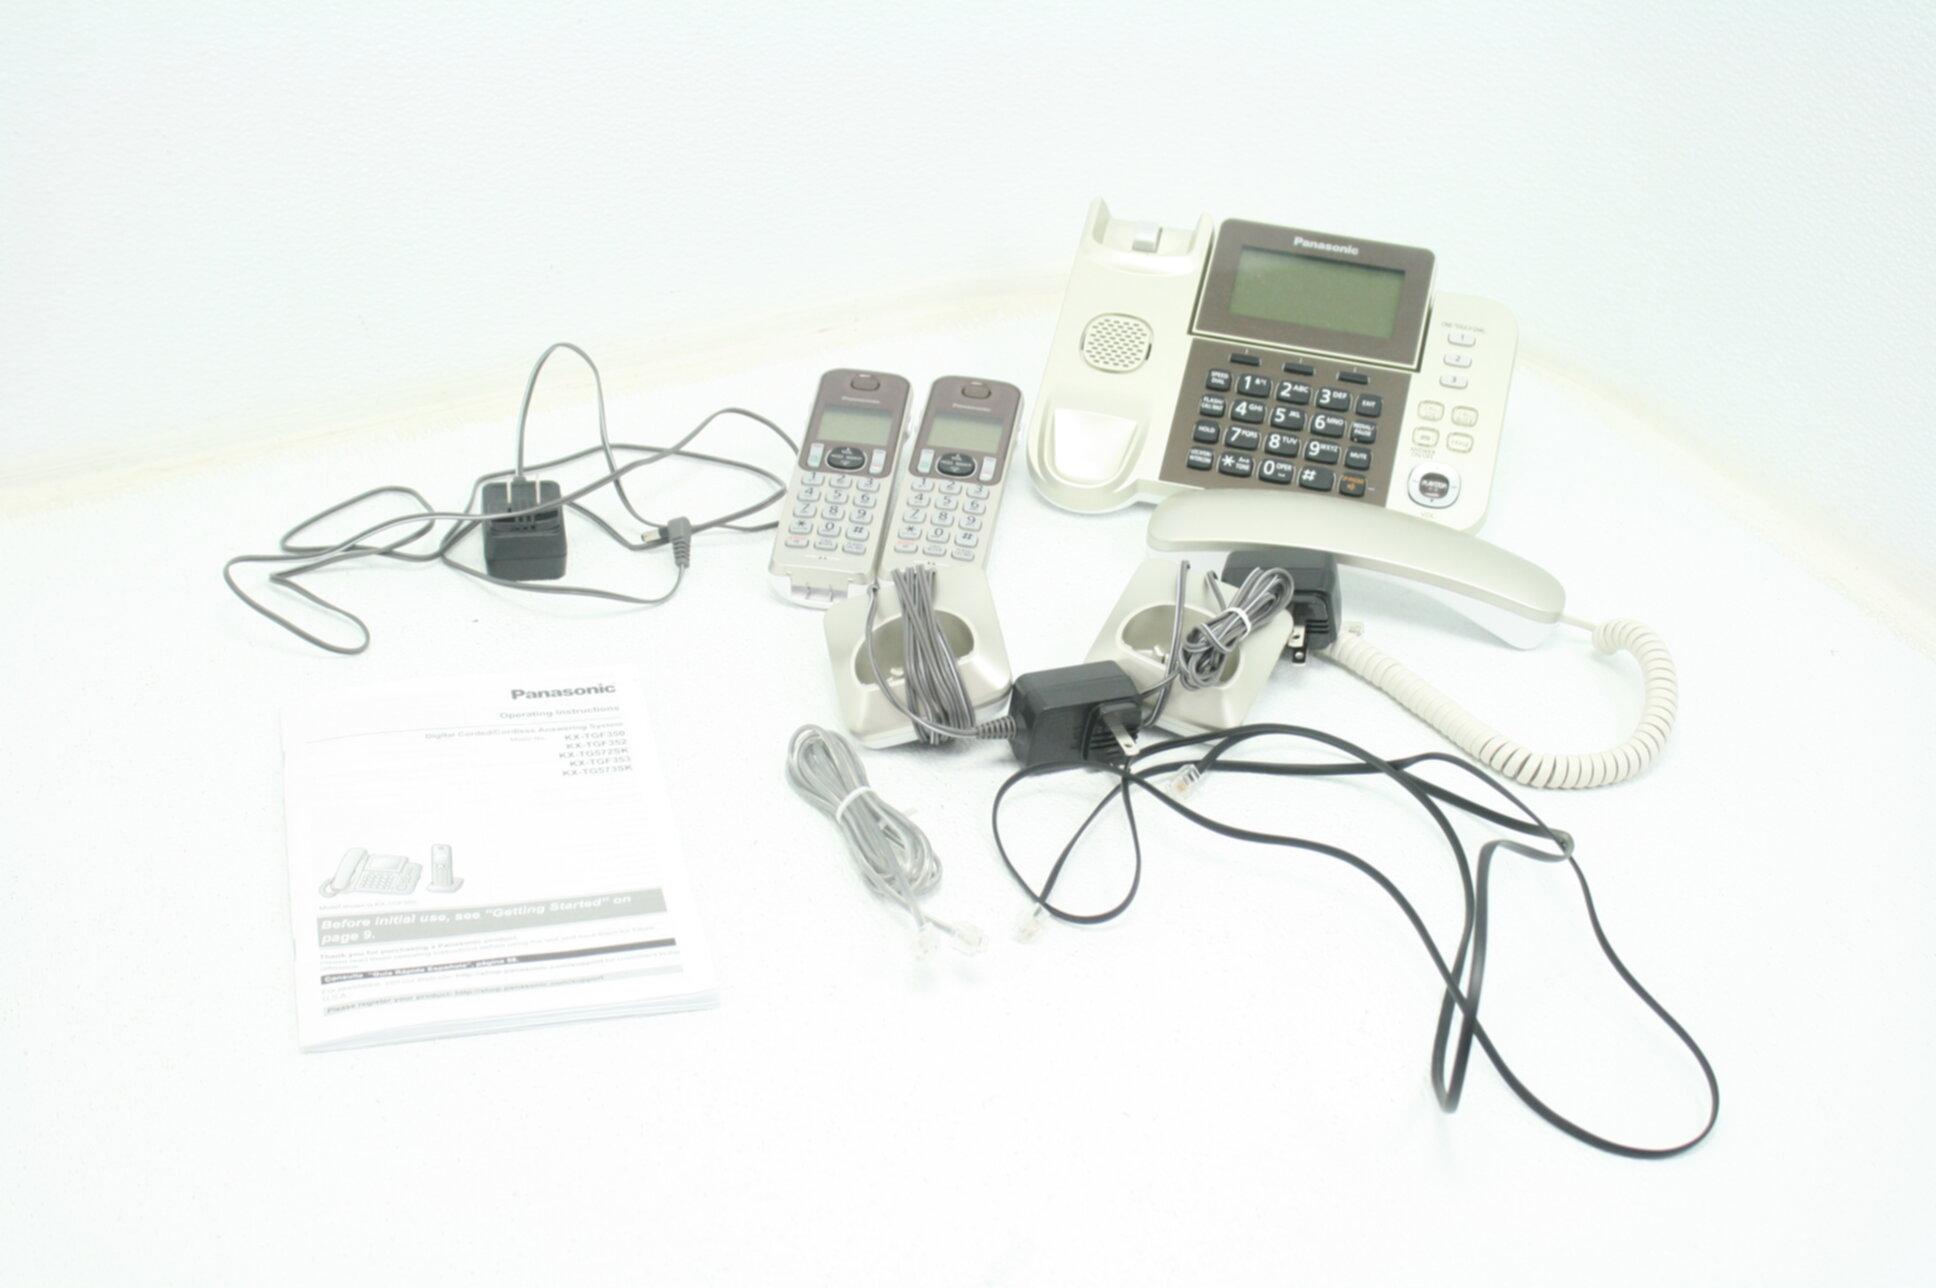 PANASONIC Corded Cordless Phone System w Answering Machine